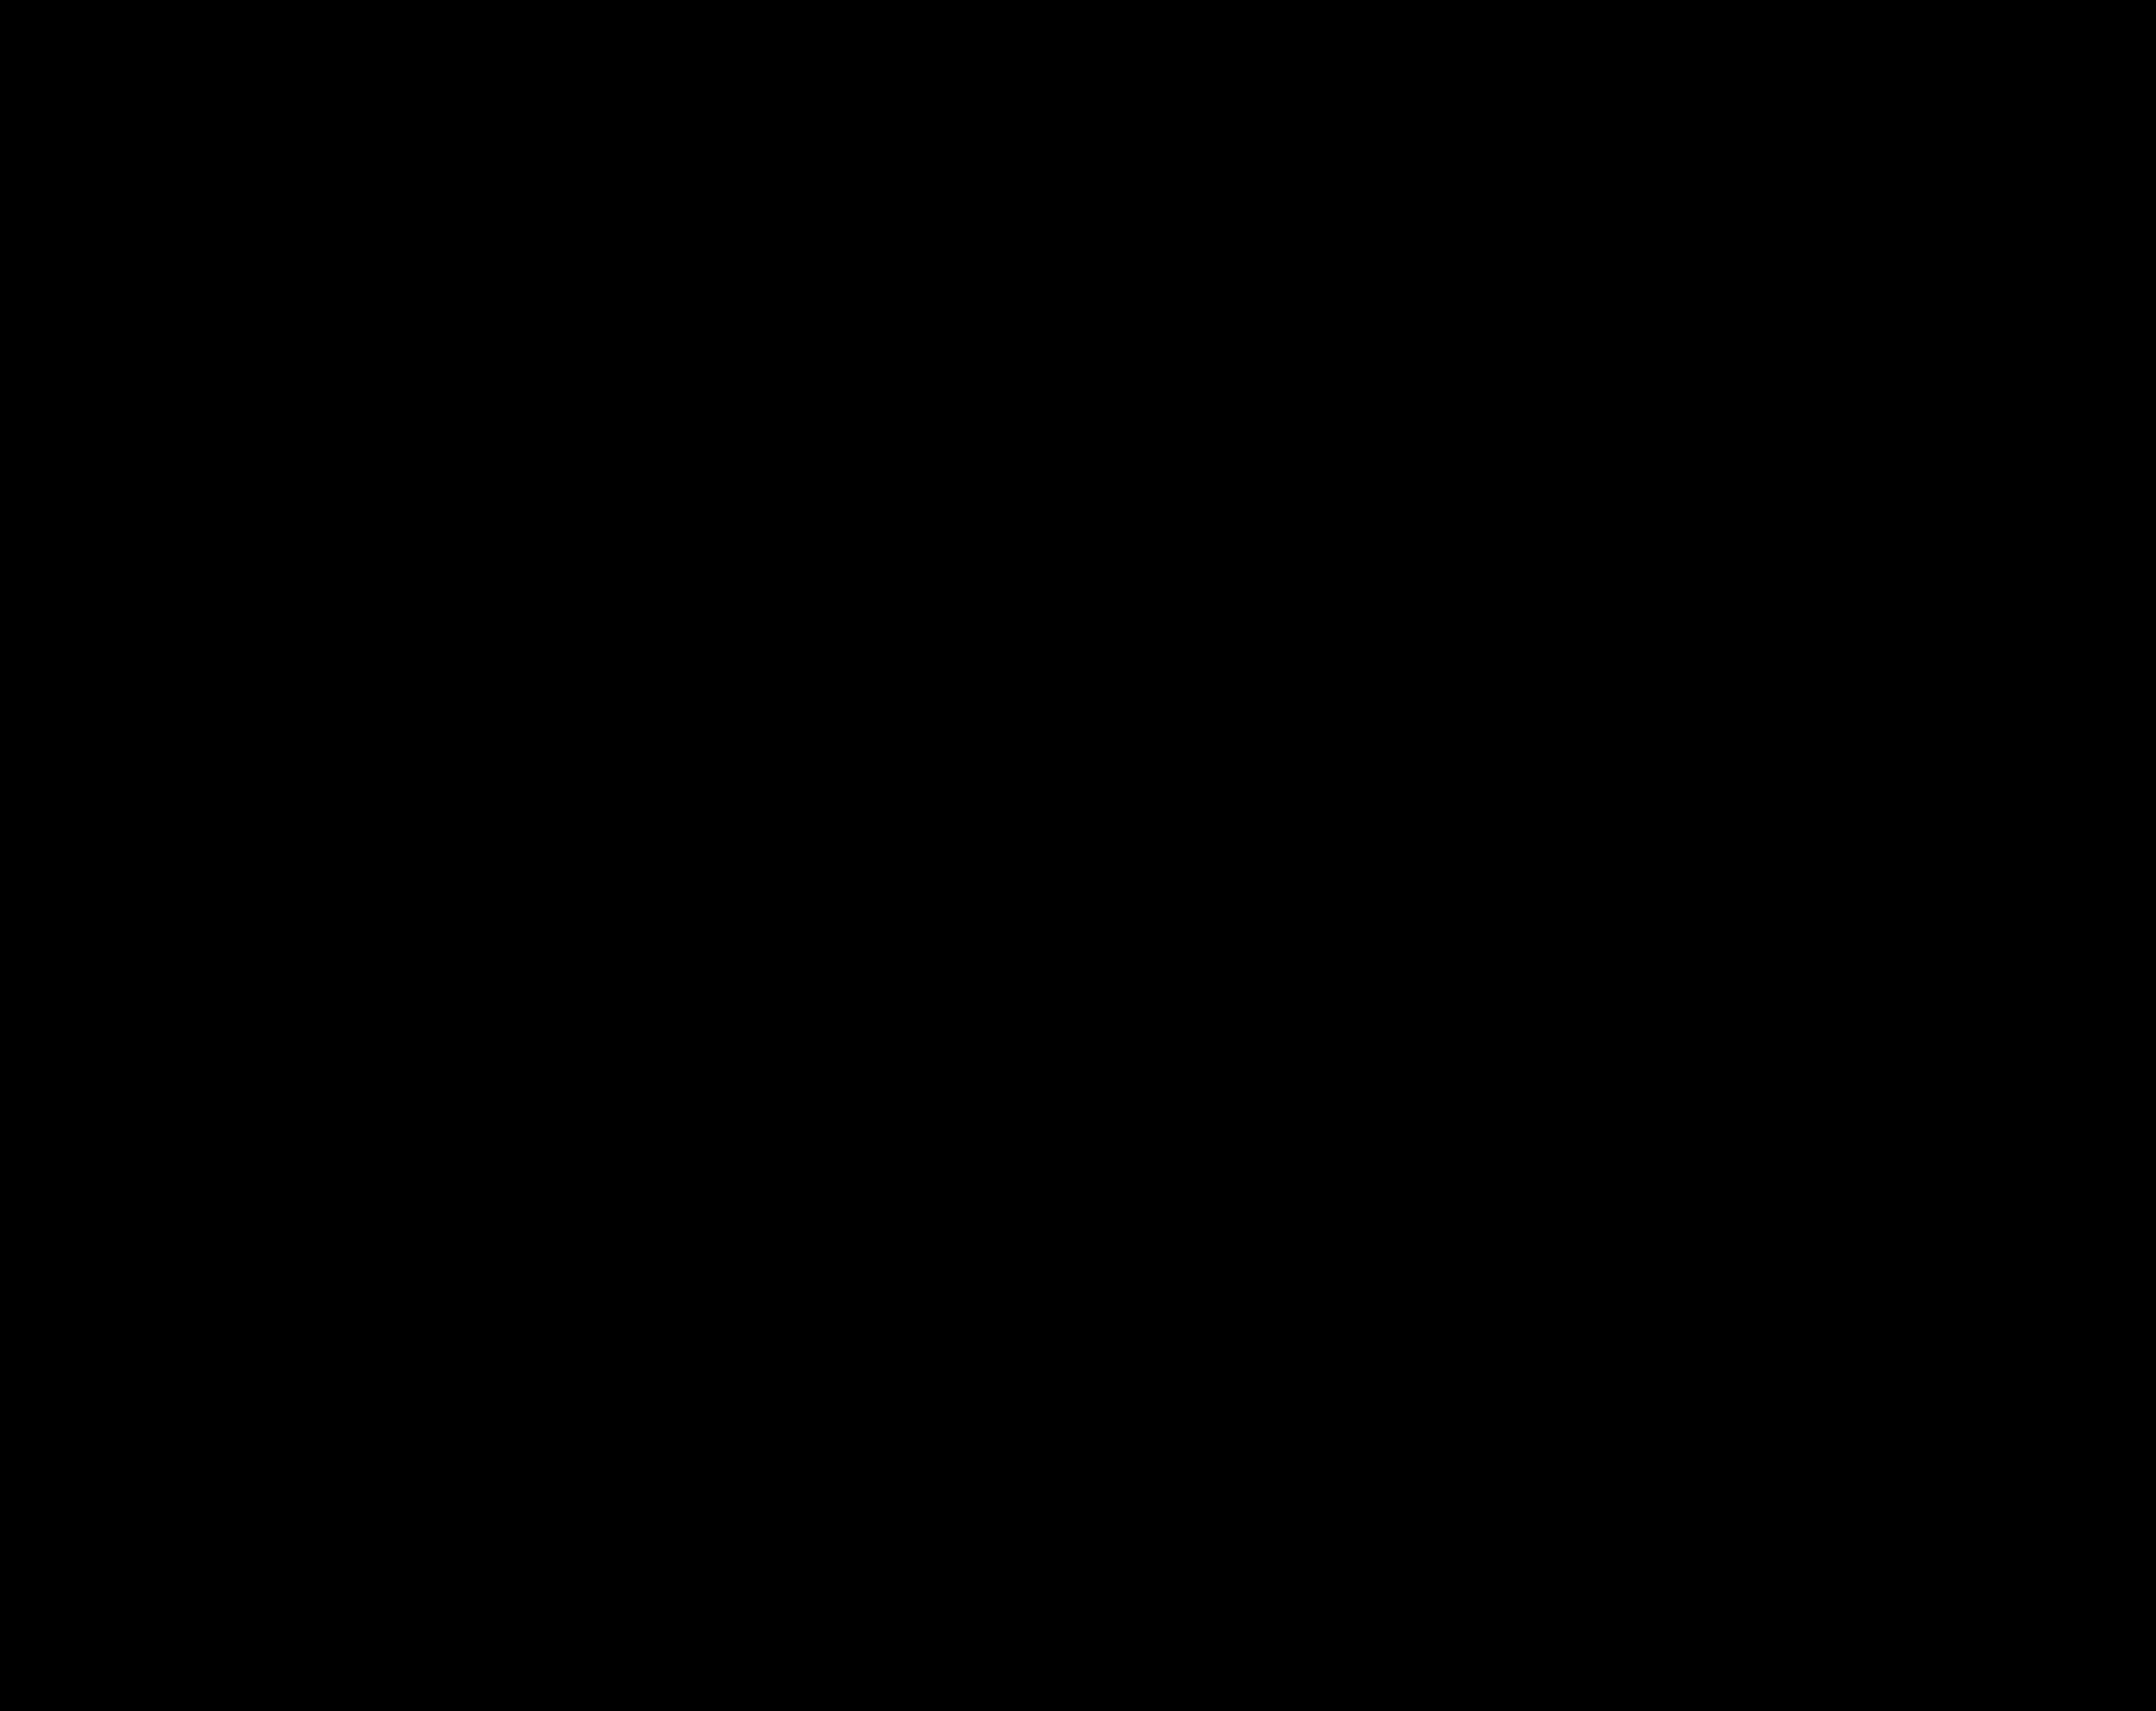 2308x1832 Clipart